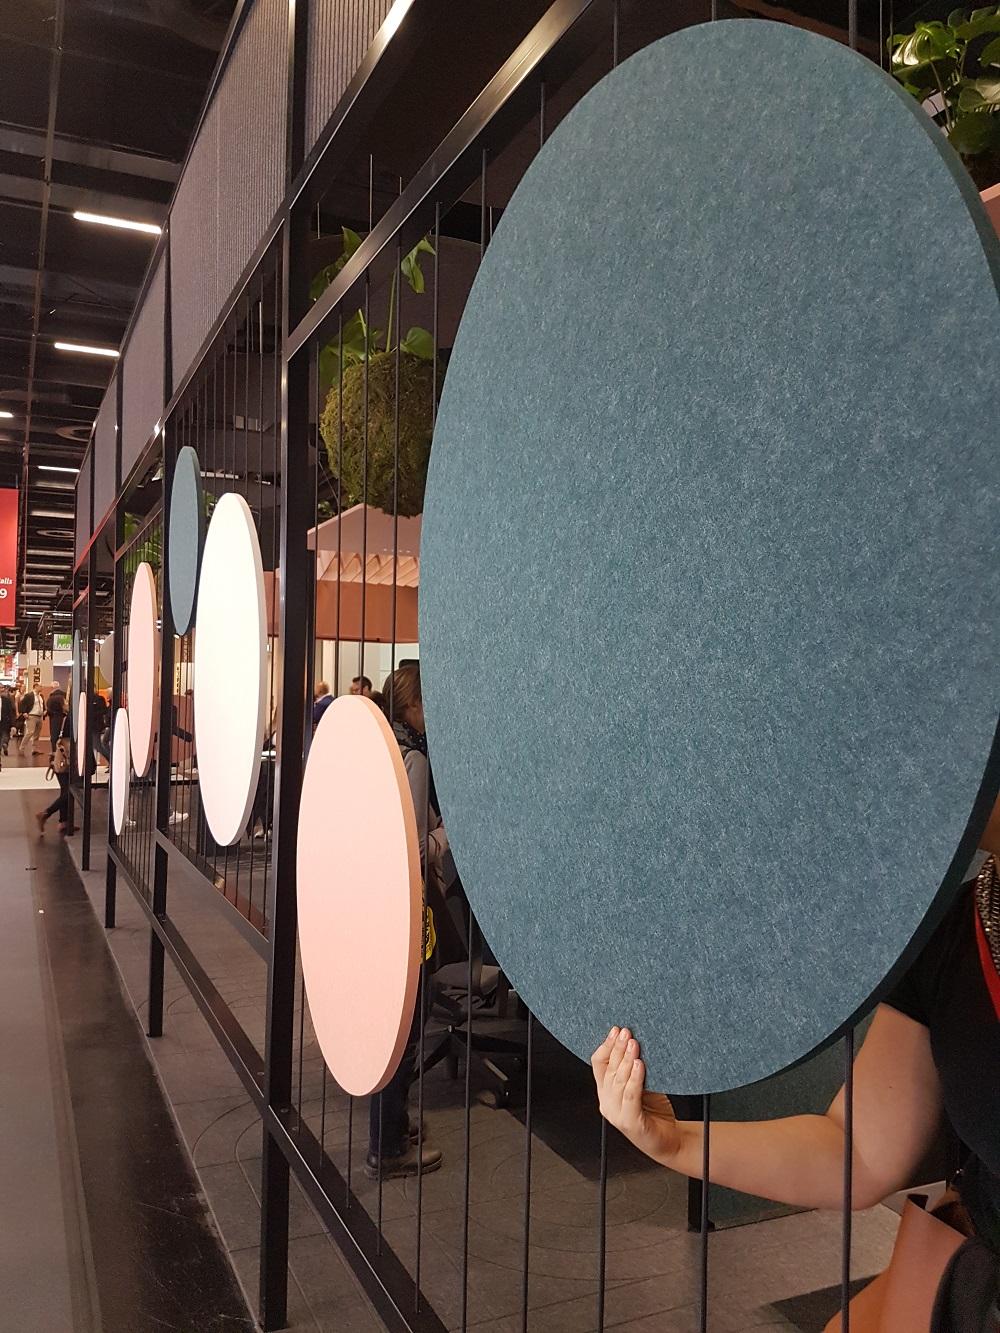 Echo Jazz offer design-led acoustic solutions